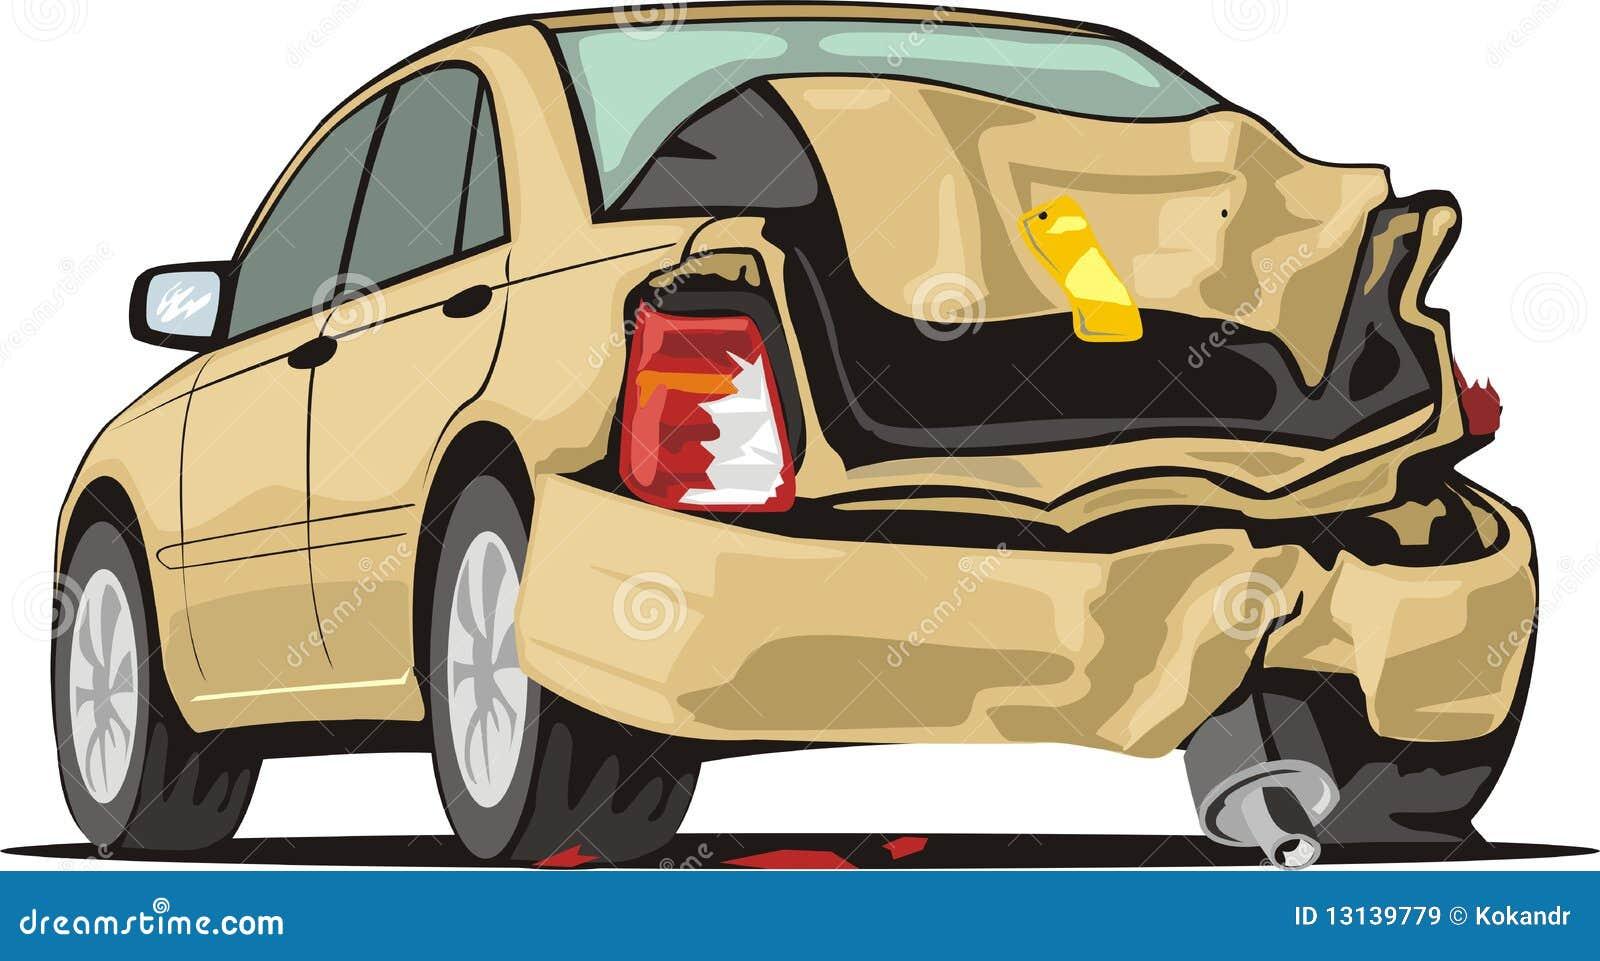 free clipart auto accident - photo #47